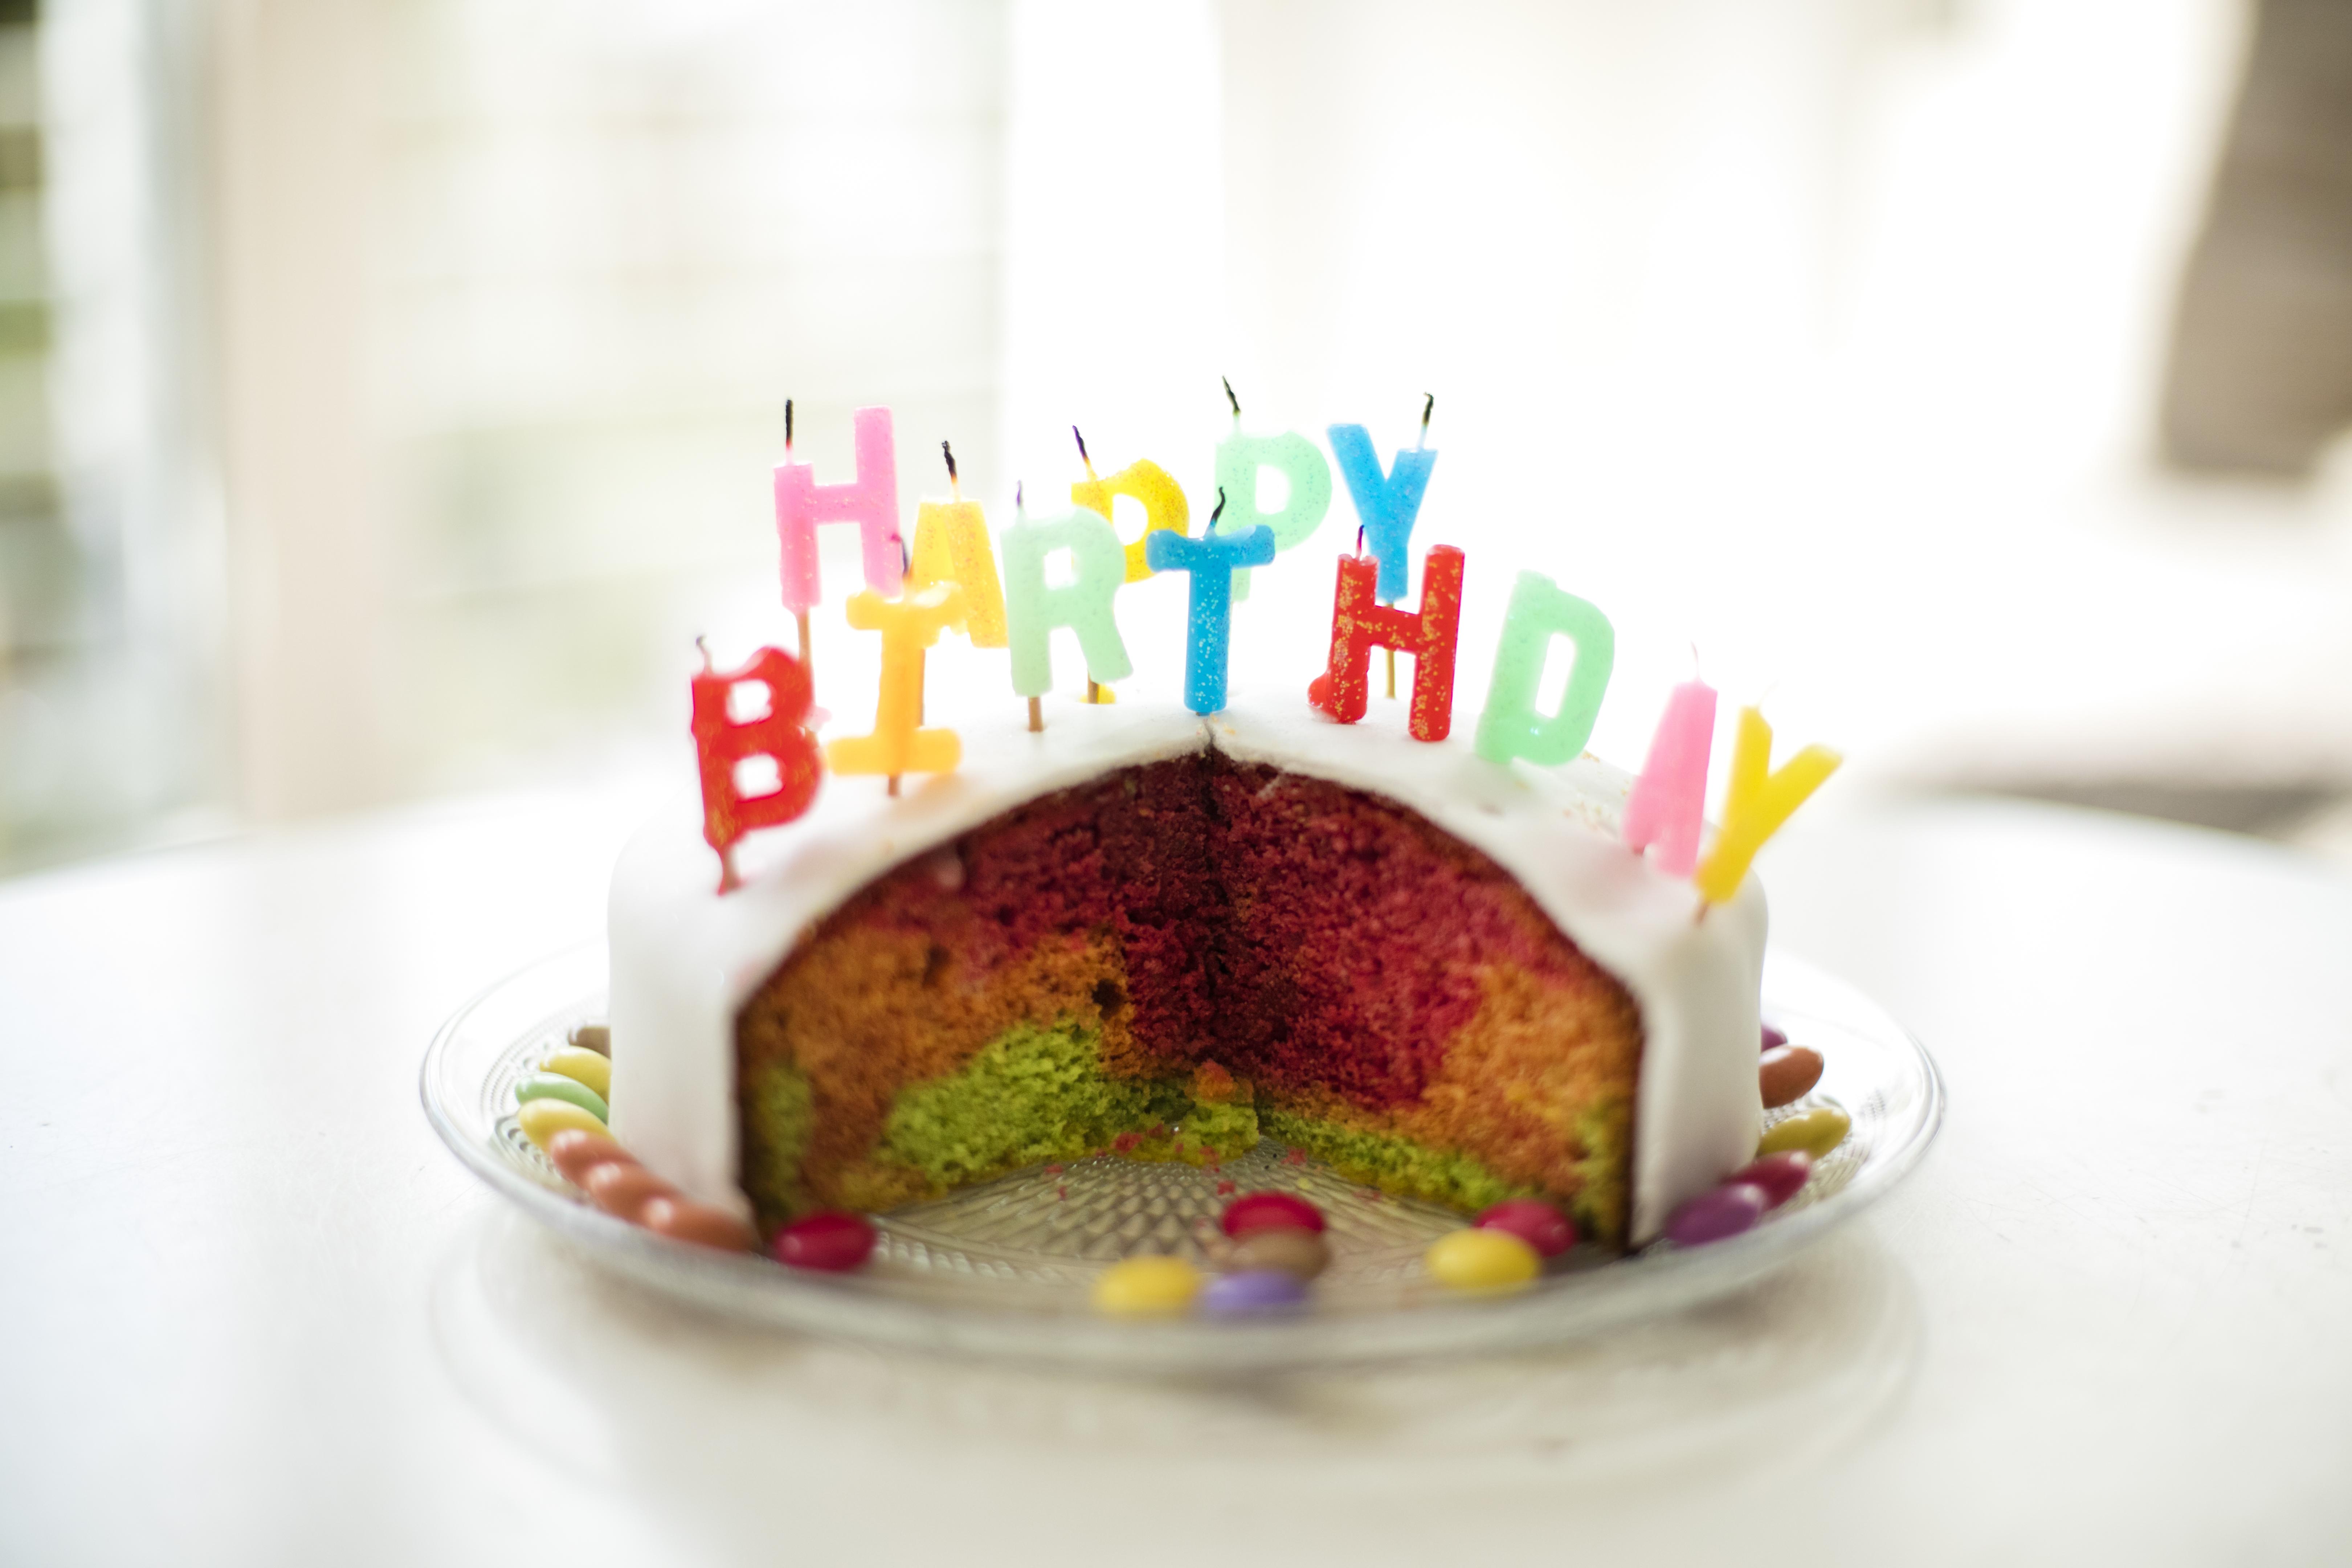 Singing Happy Birthday is illegal